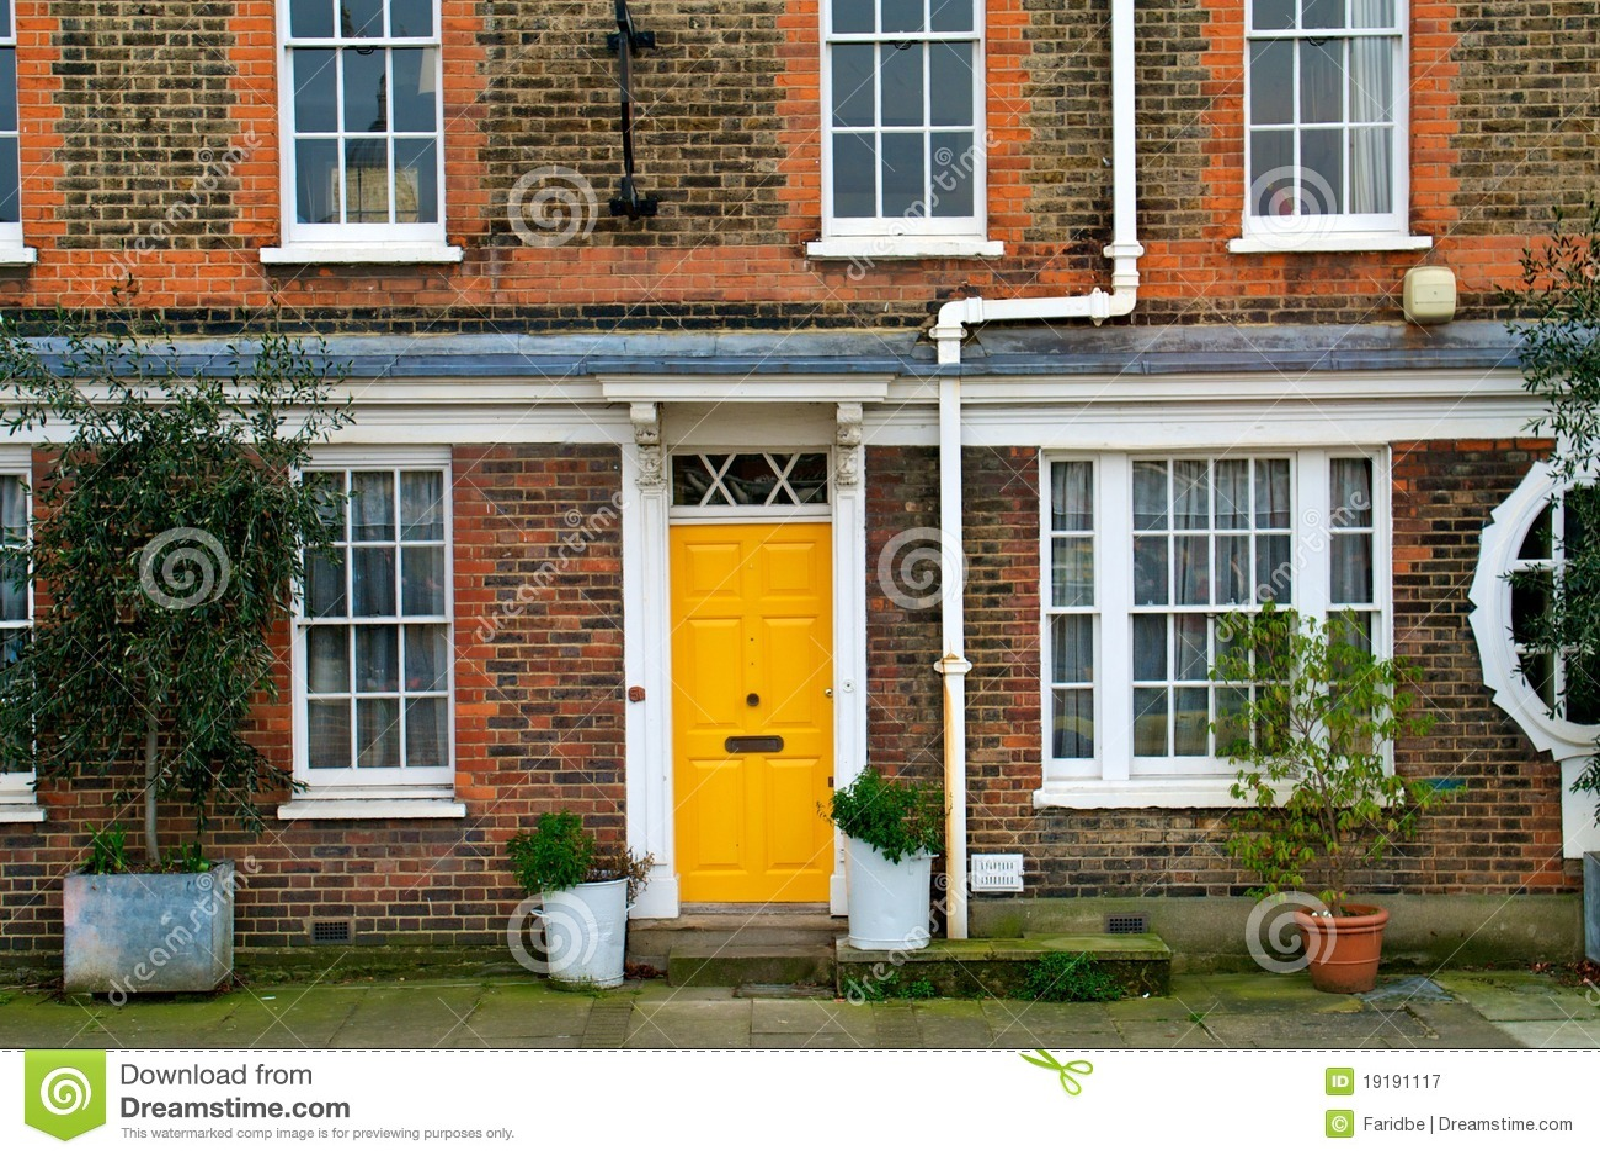 the yellow door stock image  image of home  dublin